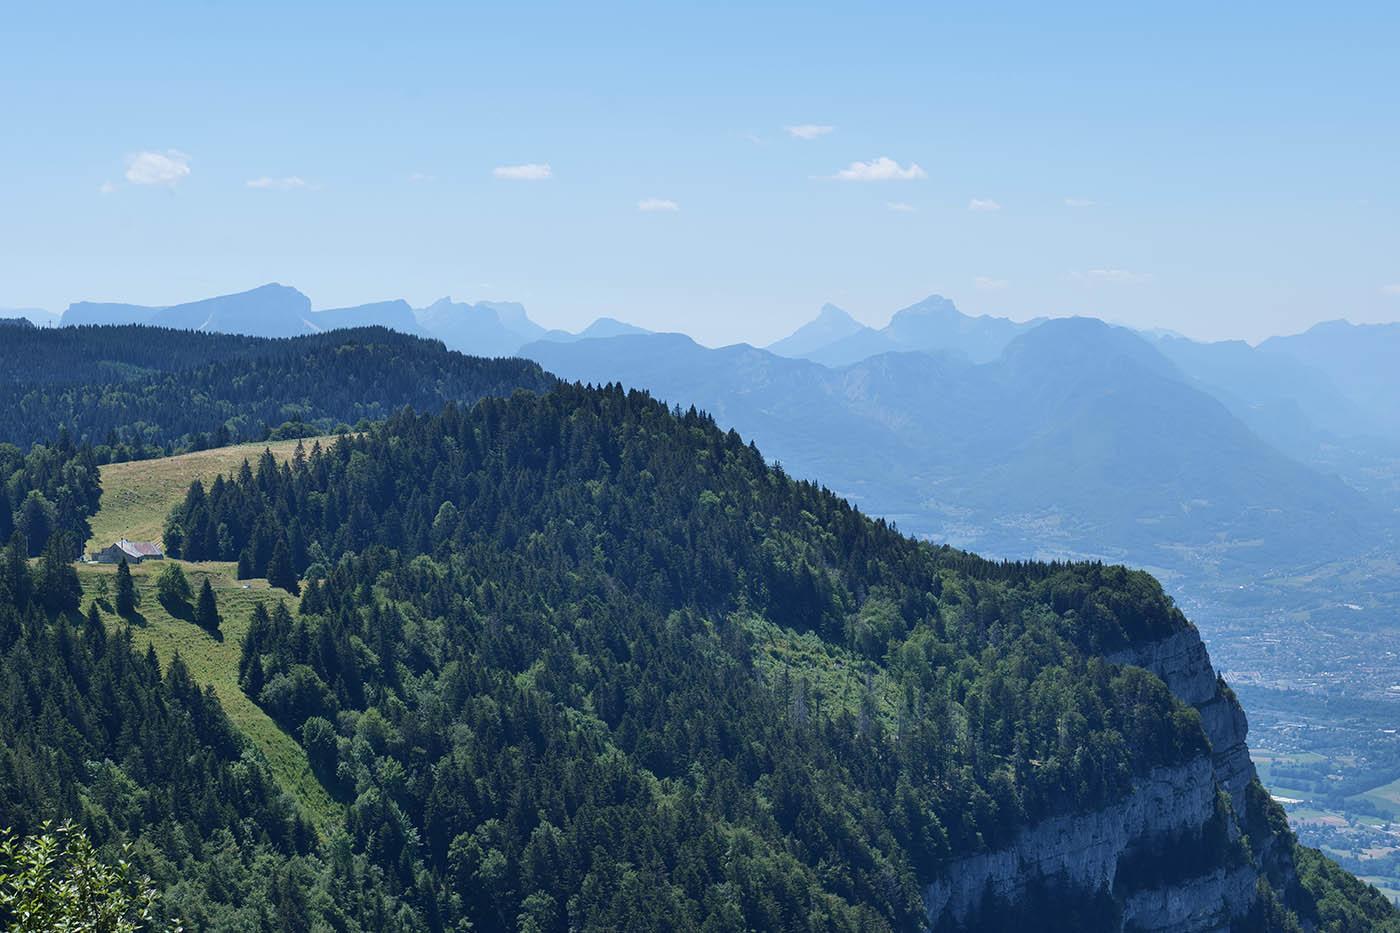 Test Appareil Photo Hybride Plein format en montagne